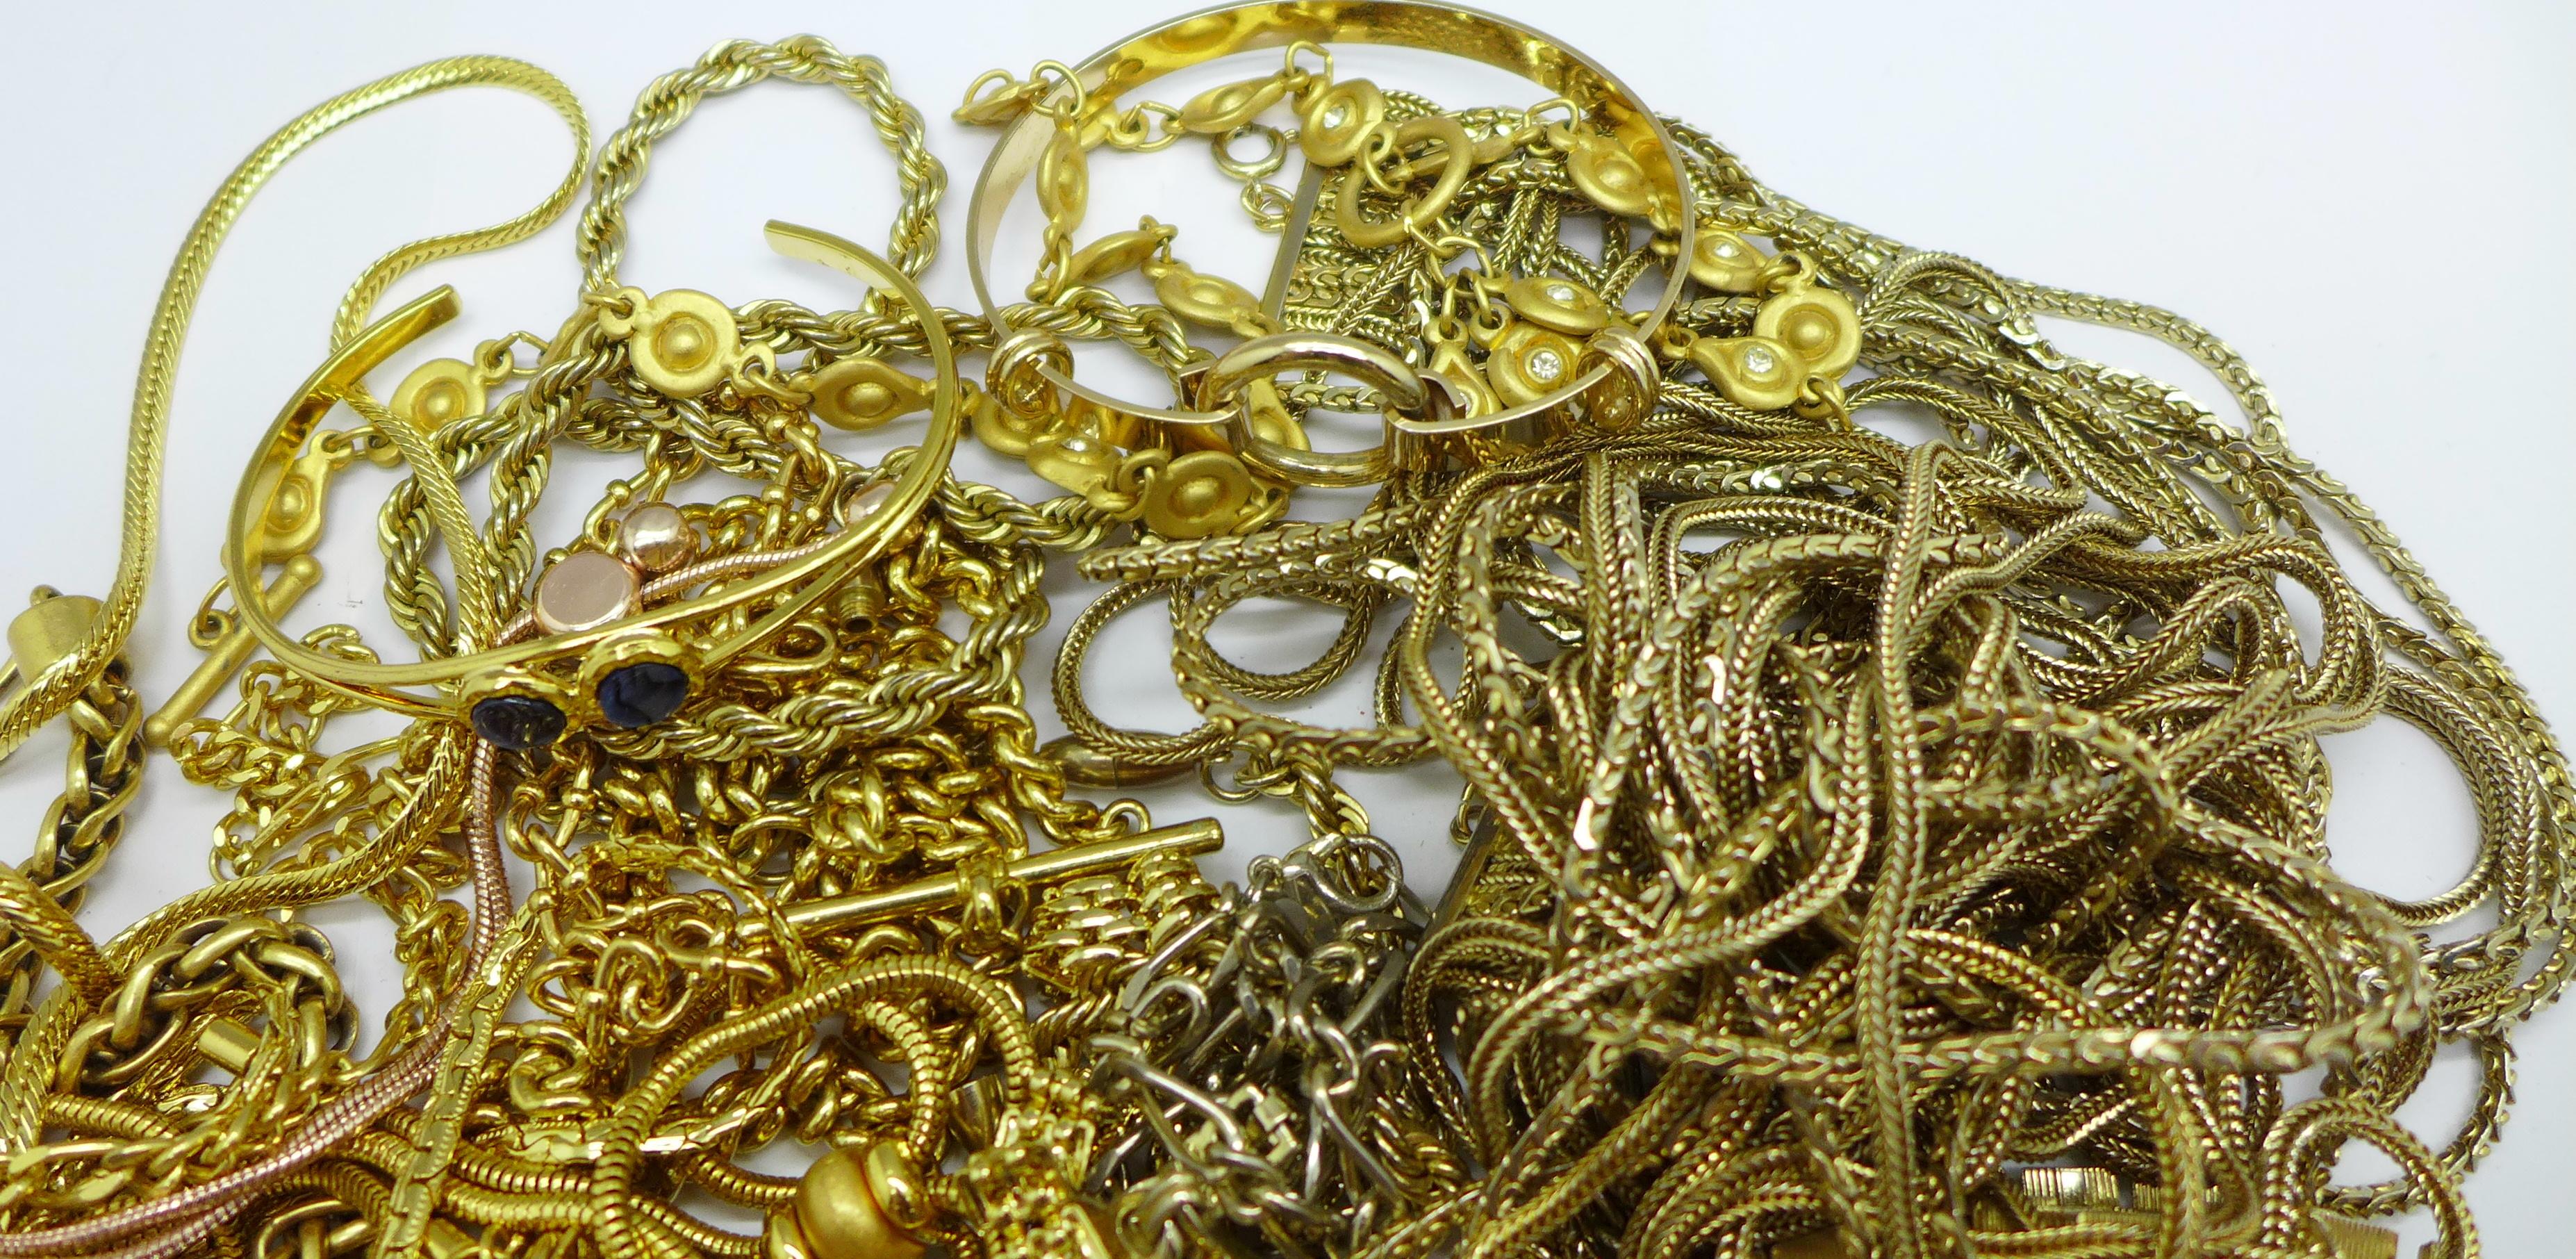 Gold tone costume jewellery - Image 3 of 3